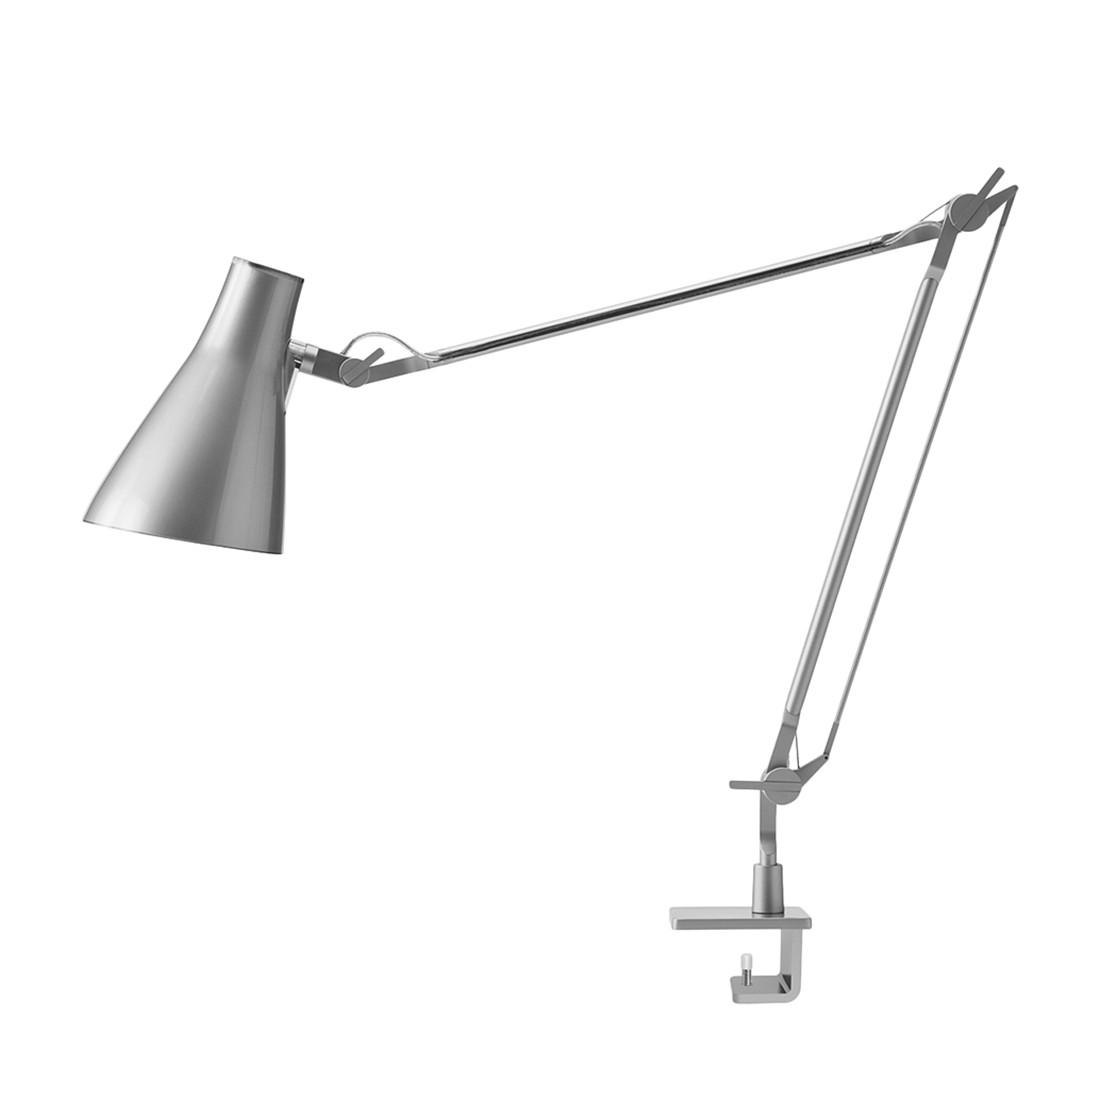 Klemm-/Möbelleuchte Solus 2 ● Metall/Kunststoff ● Grau ● 1-flammig- Blanke Design A